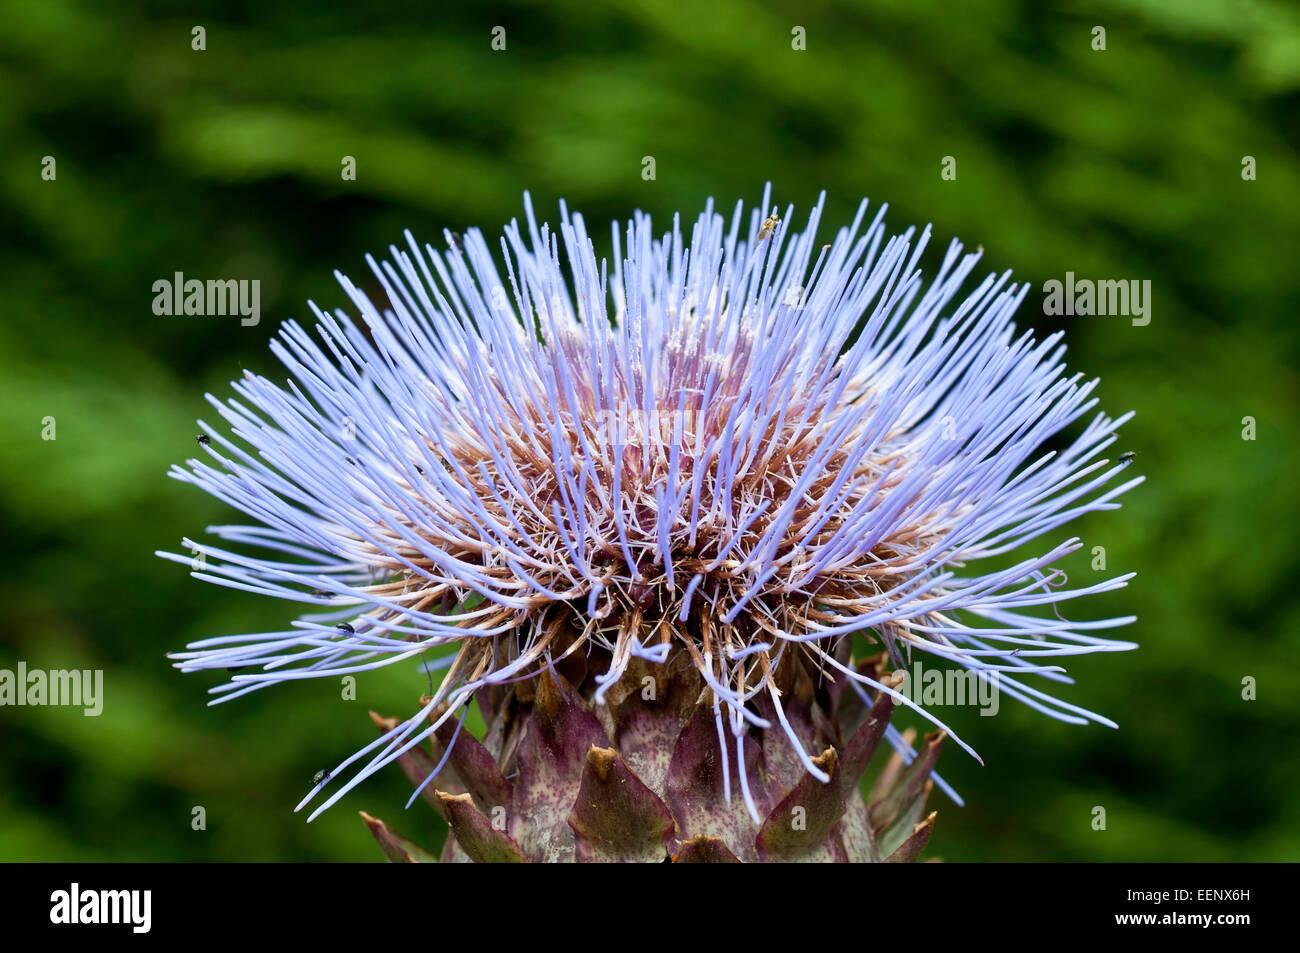 Cardoon flowerhead - Stock Image